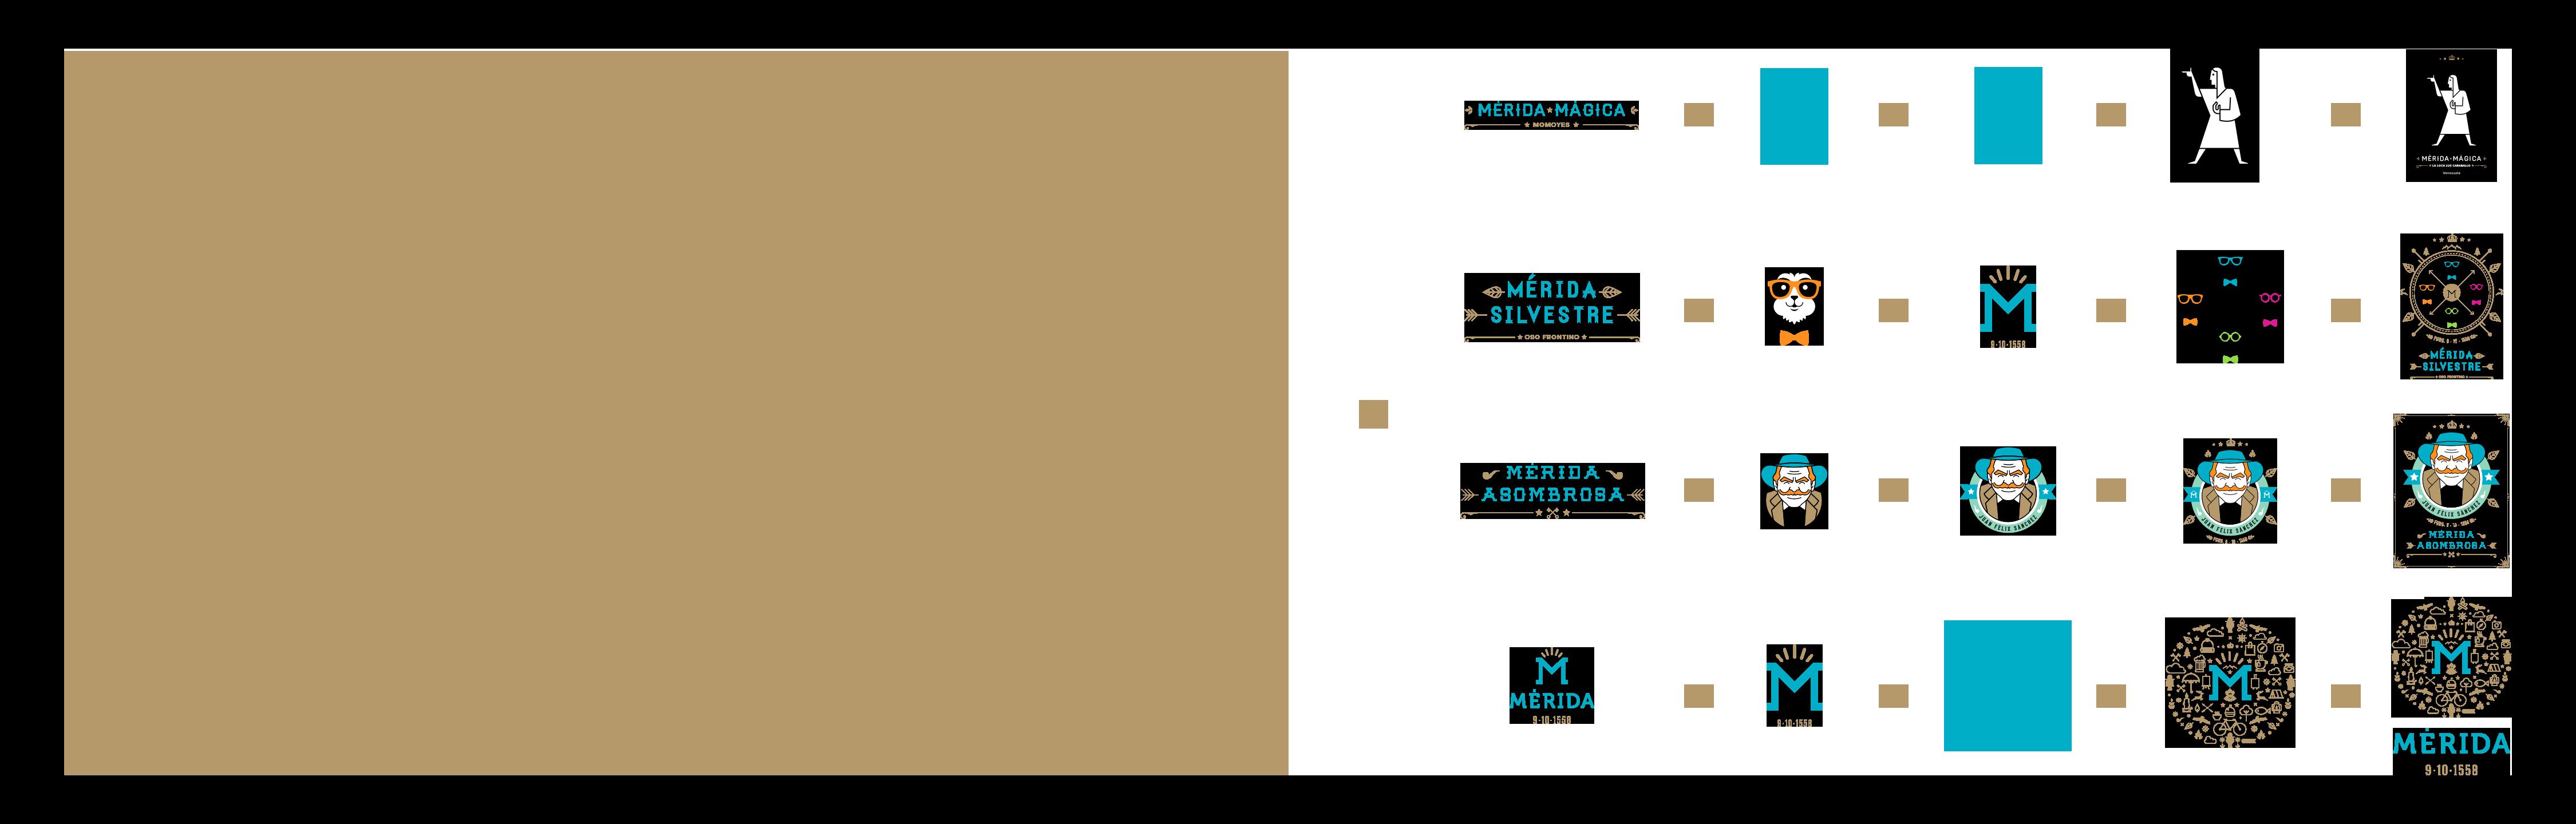 190401_MA_ICONOSSYSTEMS